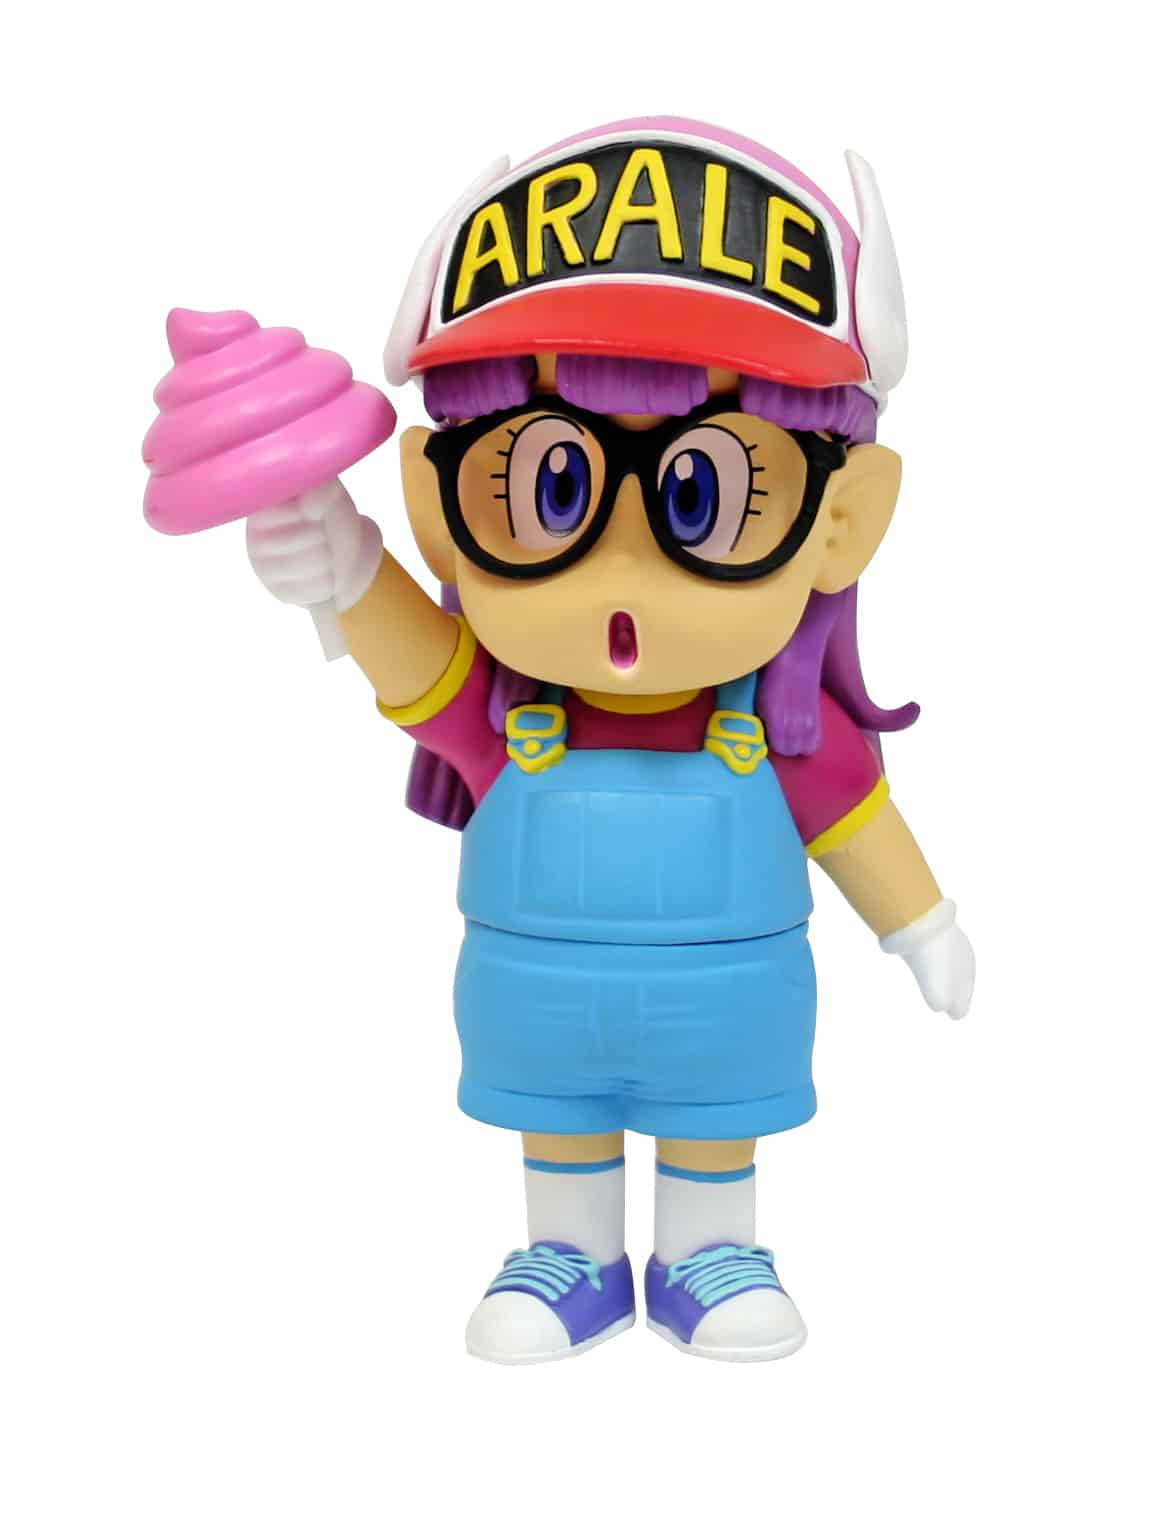 ARALE FIGURA 12 CM DR SLUMP